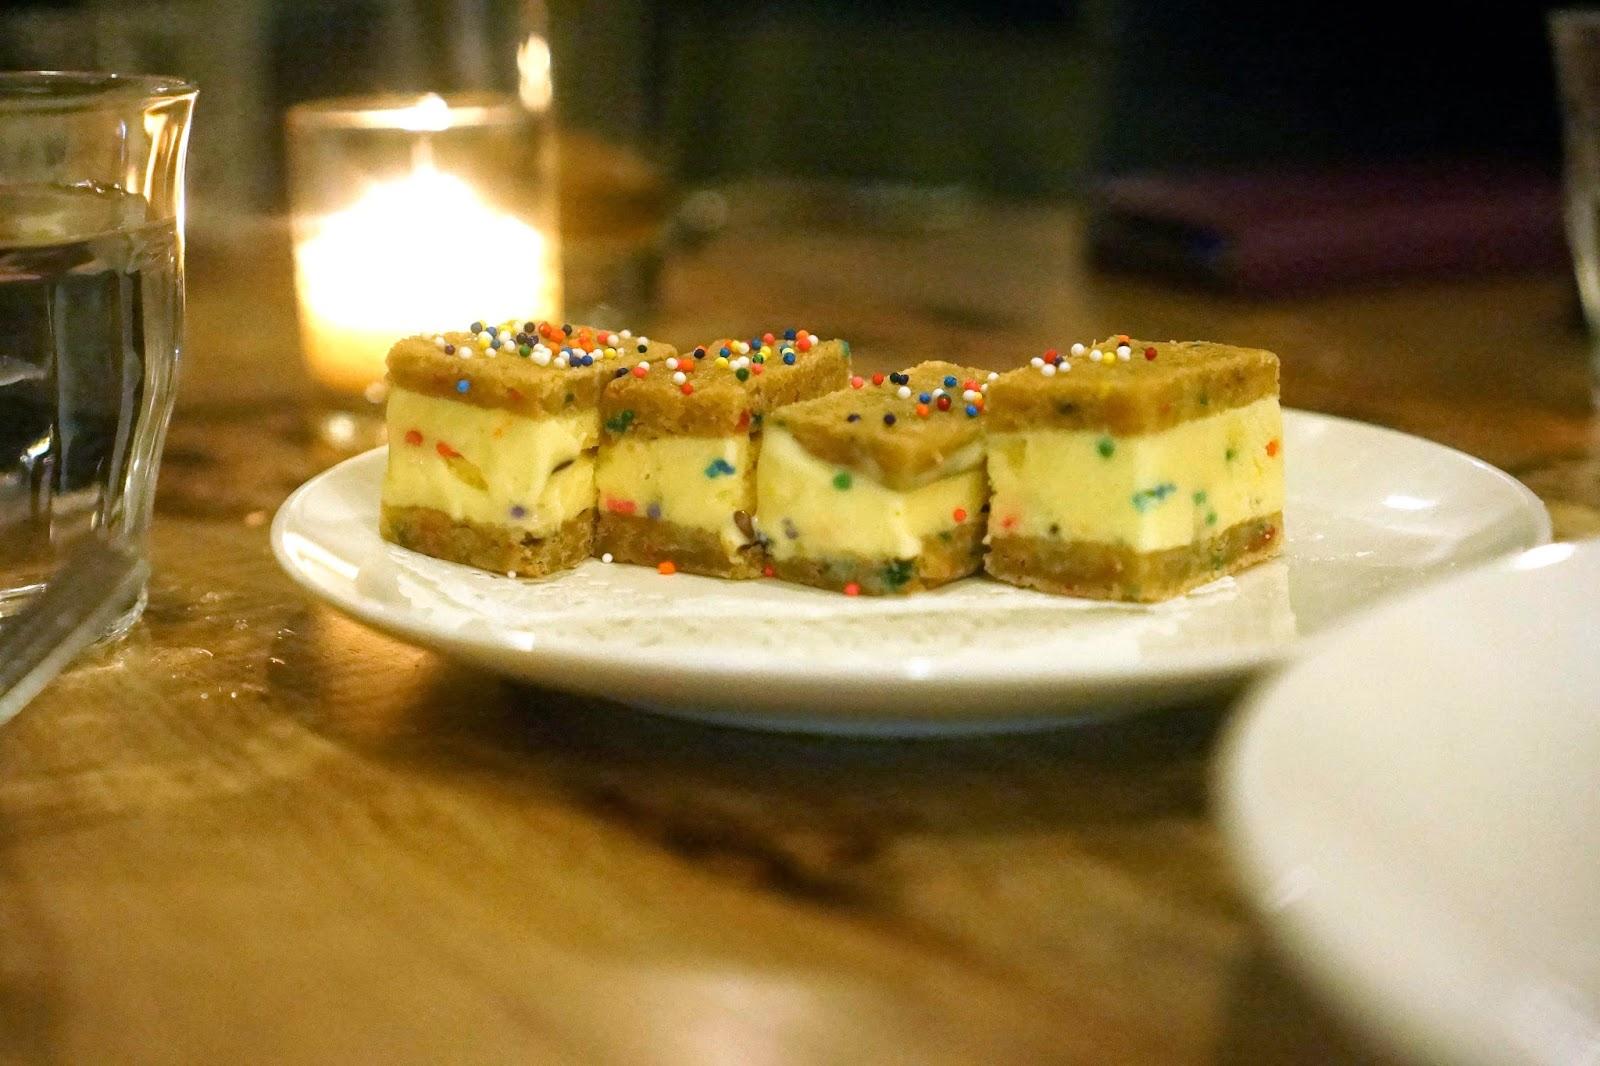 birthday cake ice cream sandwich birthday cake ice cream sandwich was ...